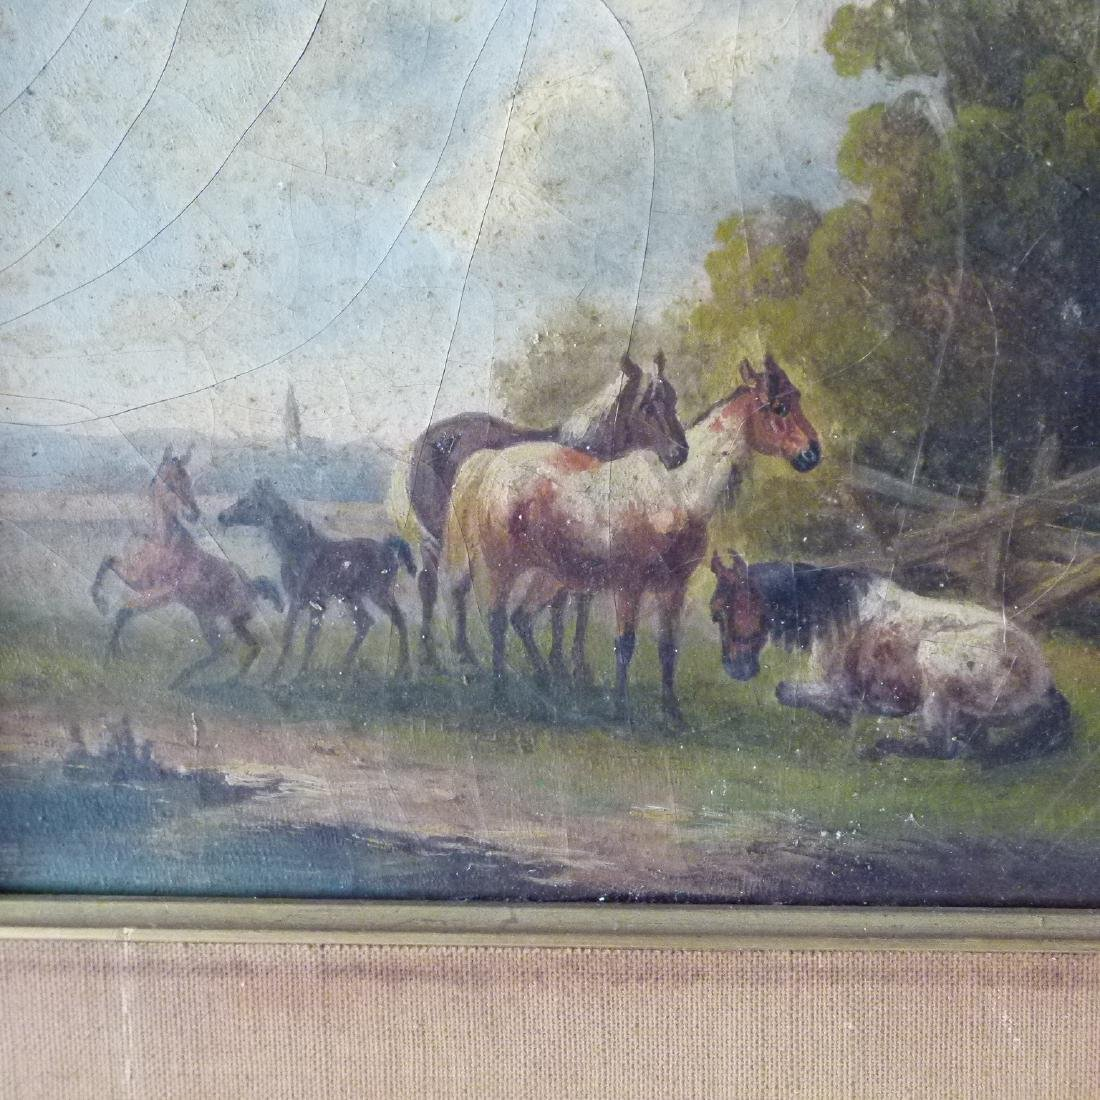 LOT (2) O/B HORSES W/ LANDSCAPE SIGNED OTTO PROGEL - 9